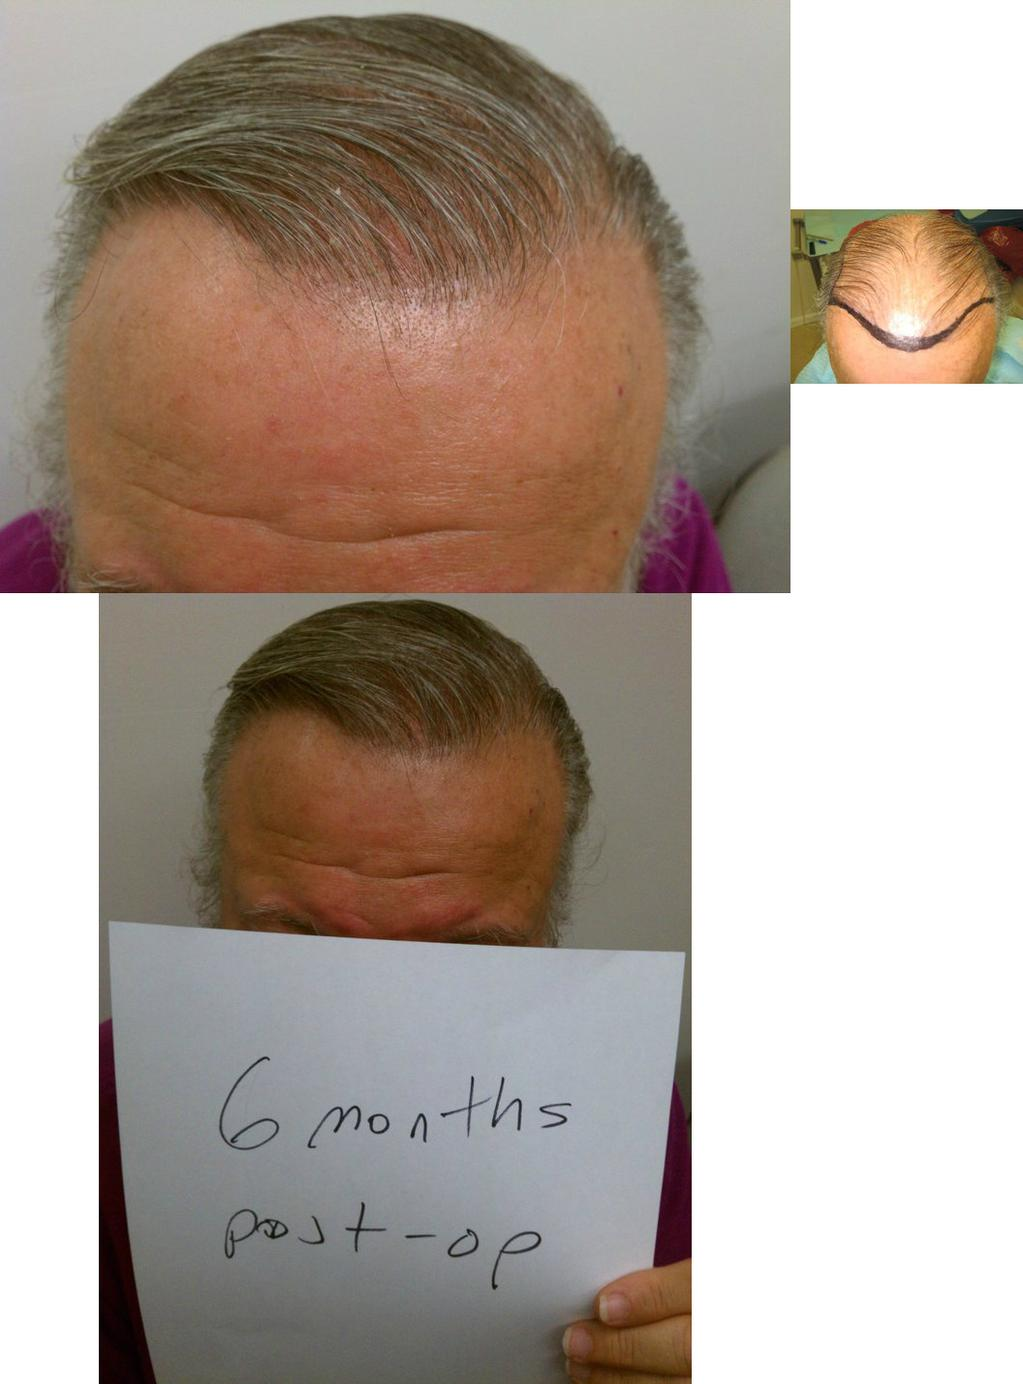 How fast does the hair grow